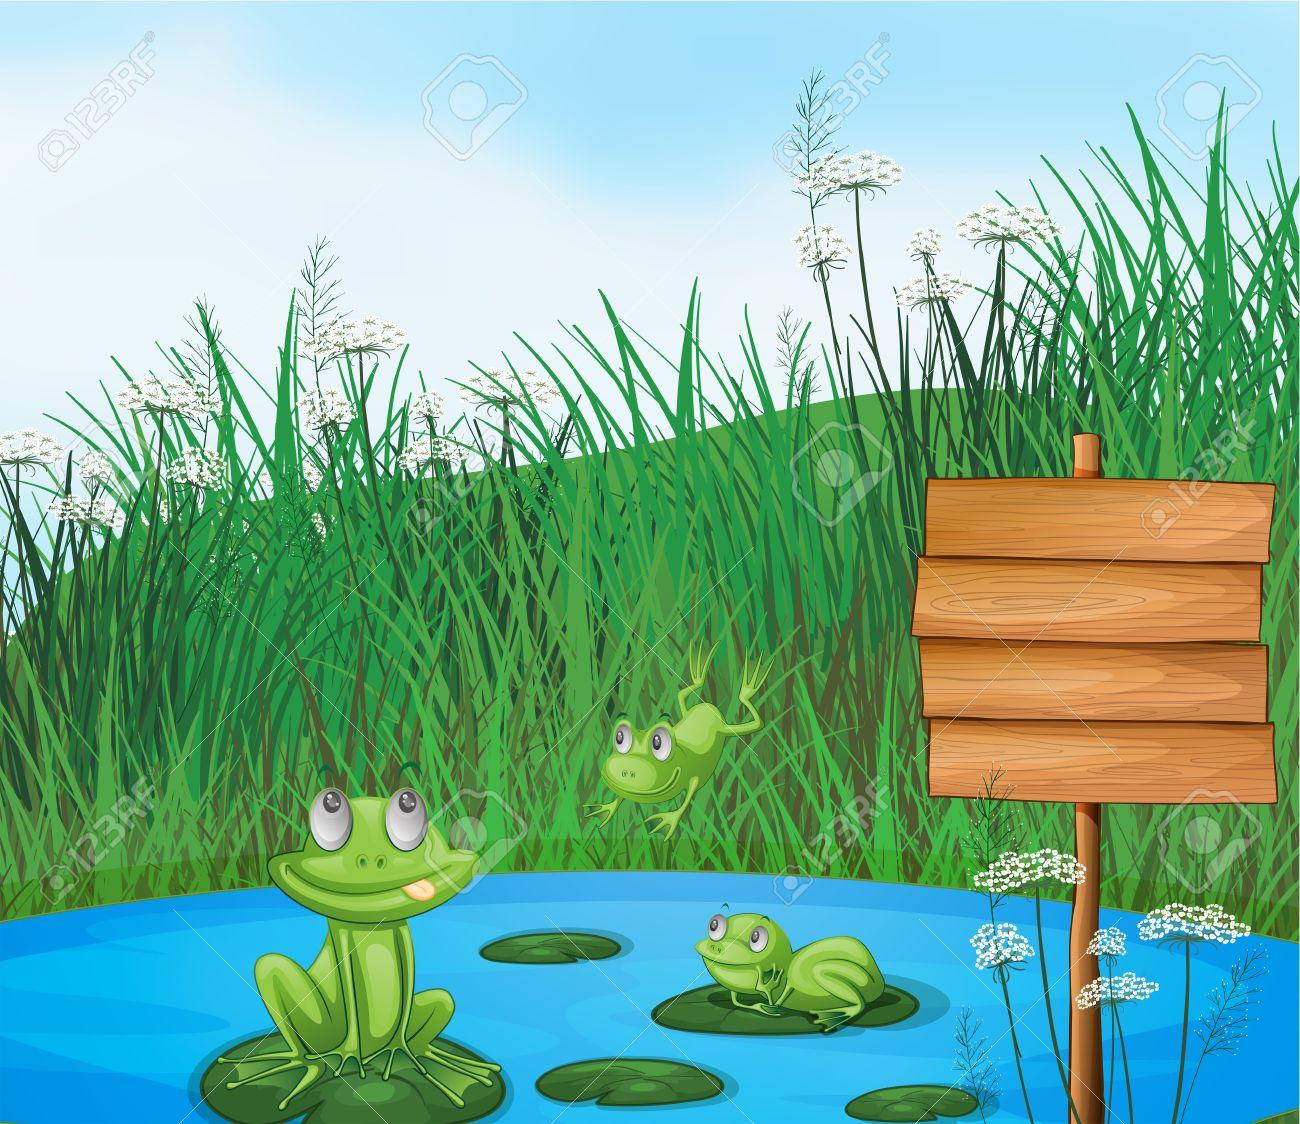 Frog Pond Clipart.